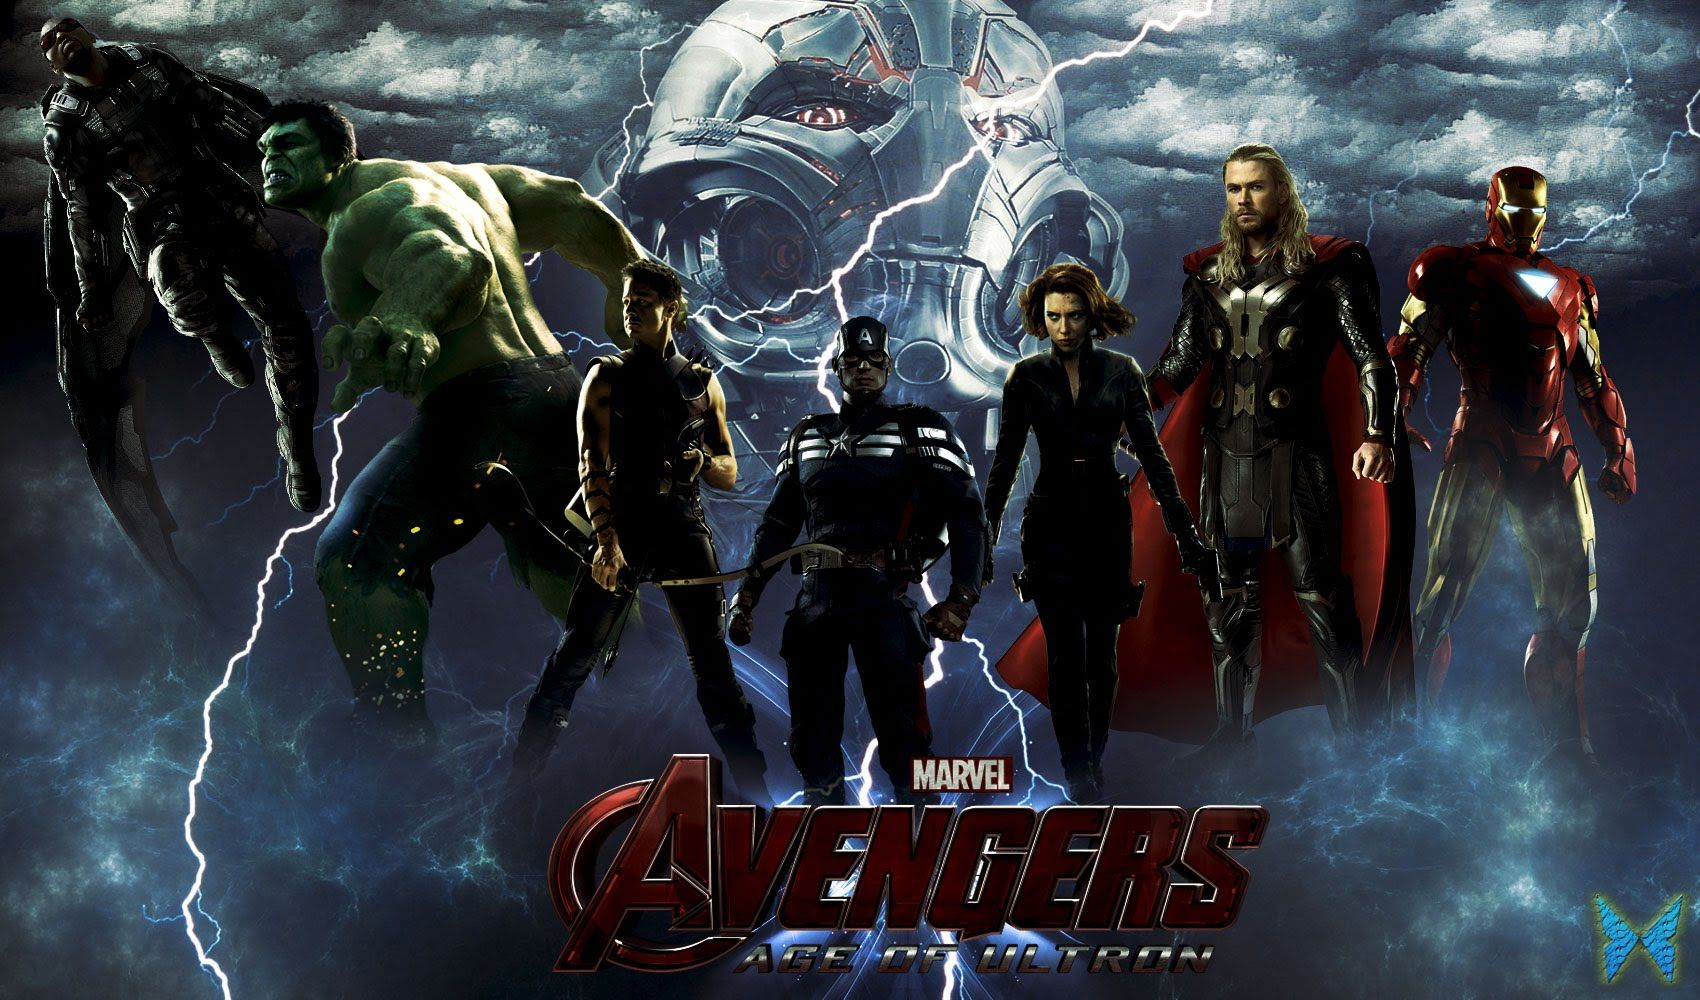 Avengers Age Of Ultron Wallpaper Phone Avengers Age Avengers